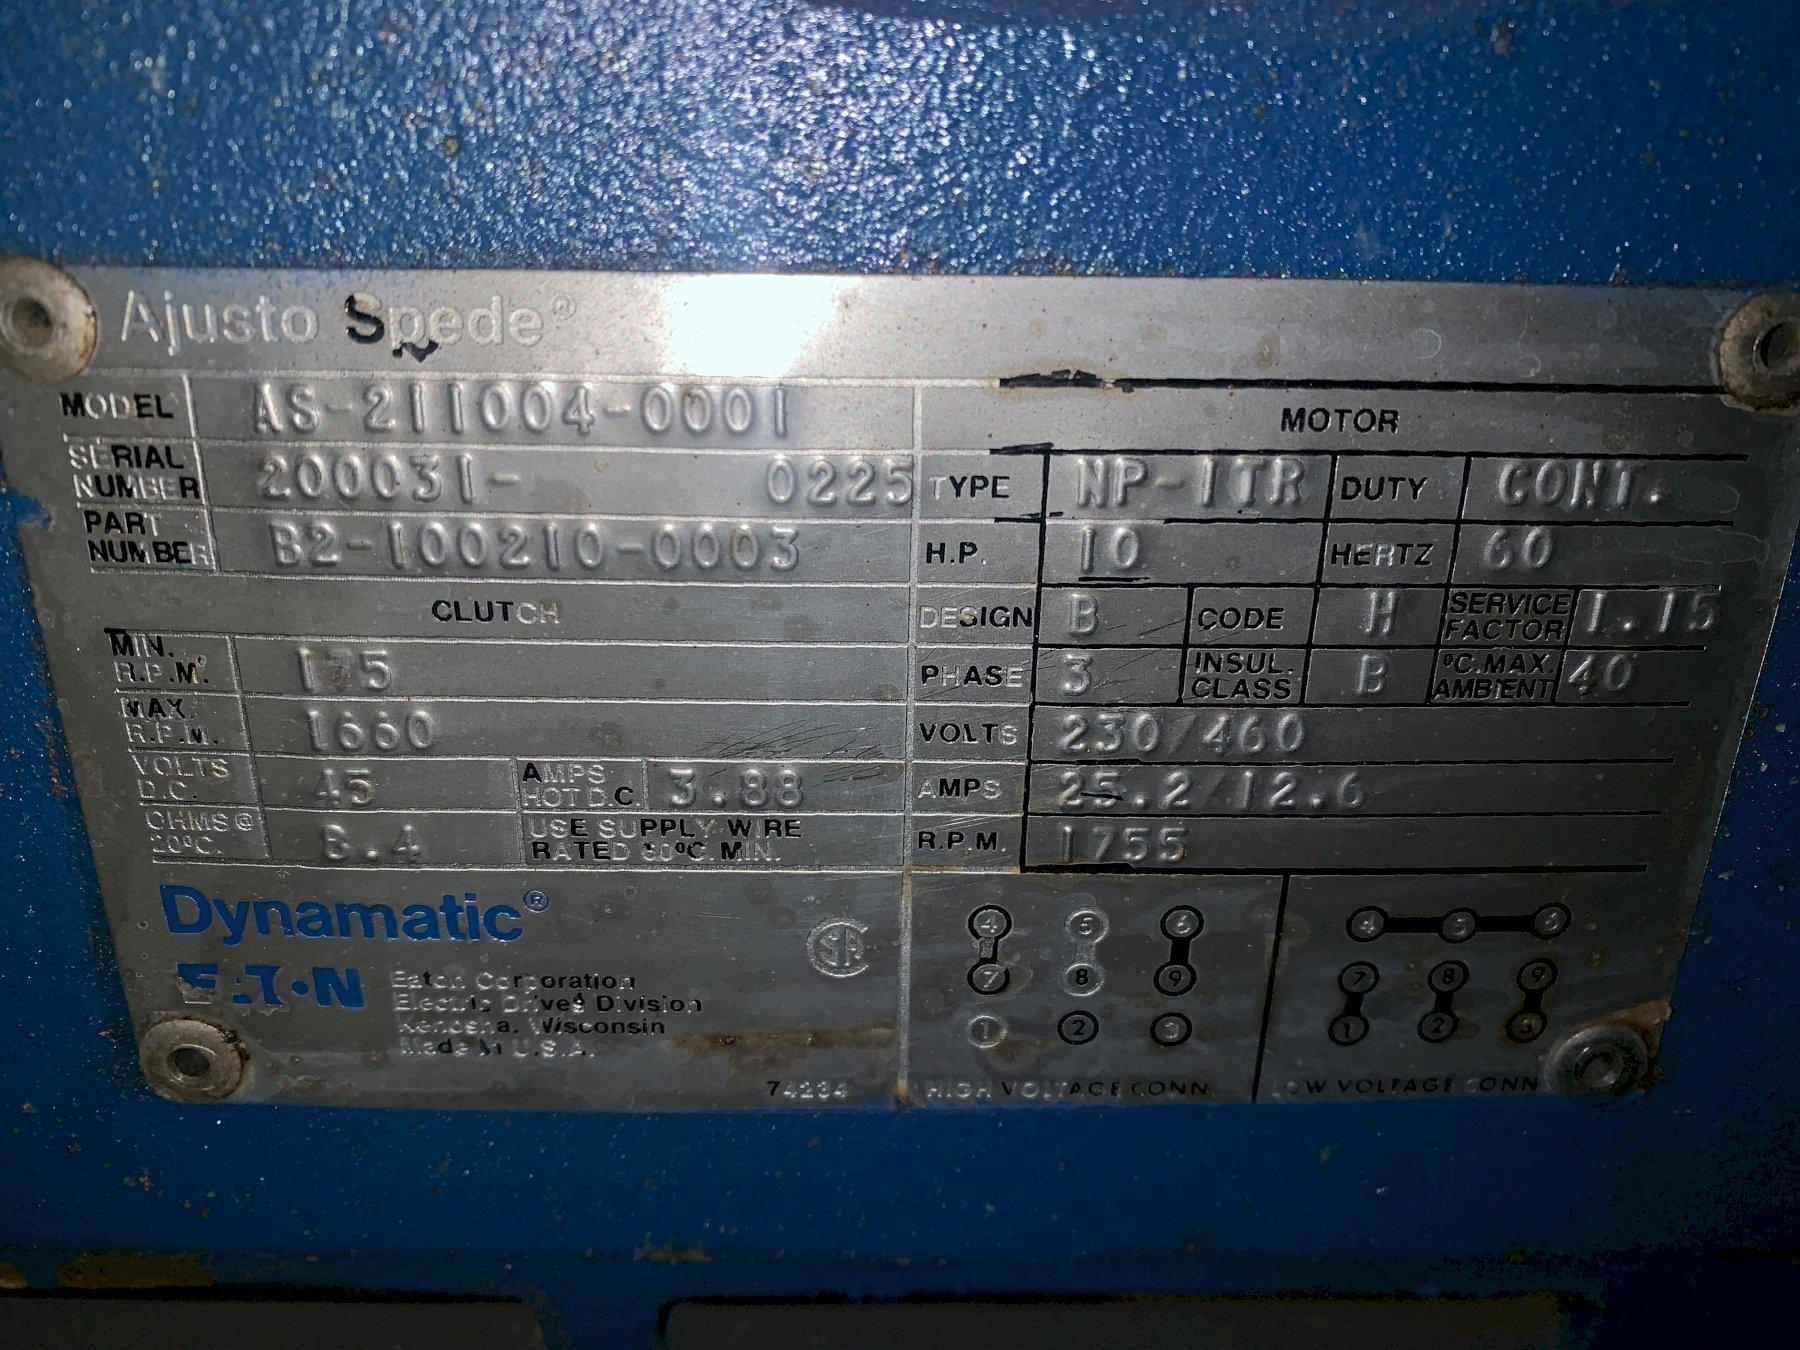 10 HP DYNAMATIC TYPE NP-ITR / MODEL B2-100210-0003 ADJUSTO SPEED MOTOR: STOCK #11927